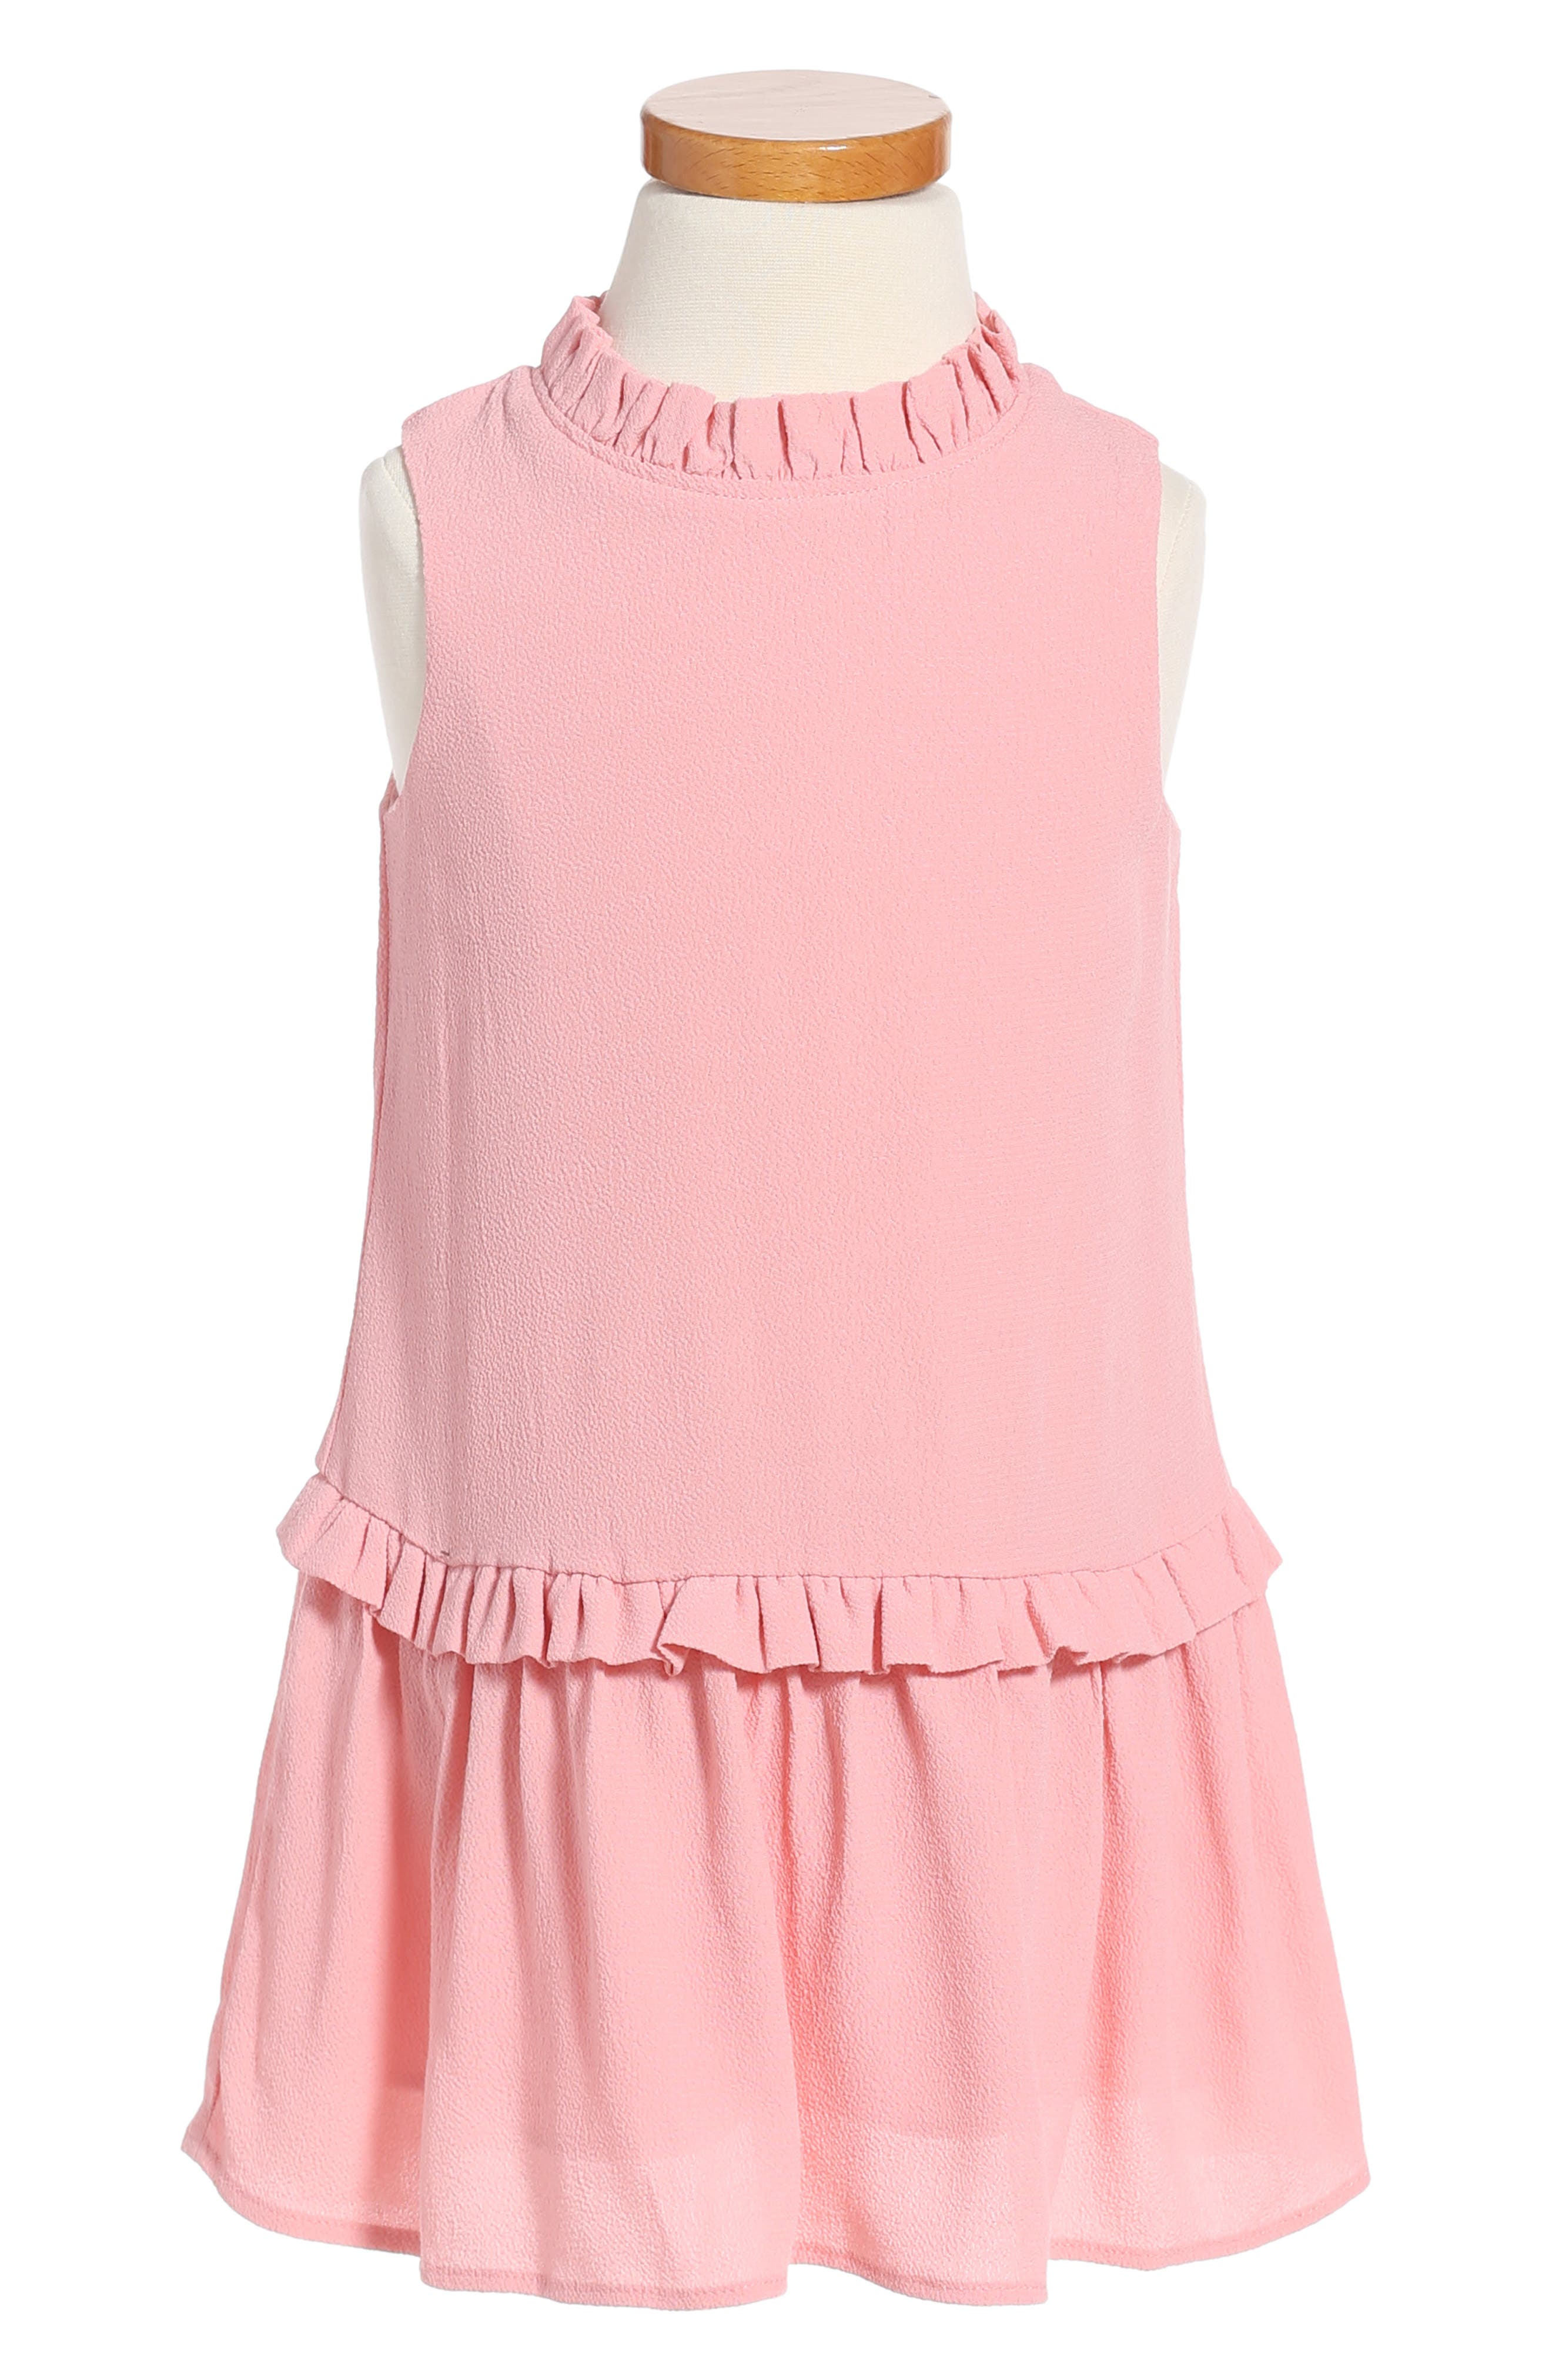 Alternate Image 1 Selected - kate spade new york ruffle collar dress (Toddler Girls & Little Girls)